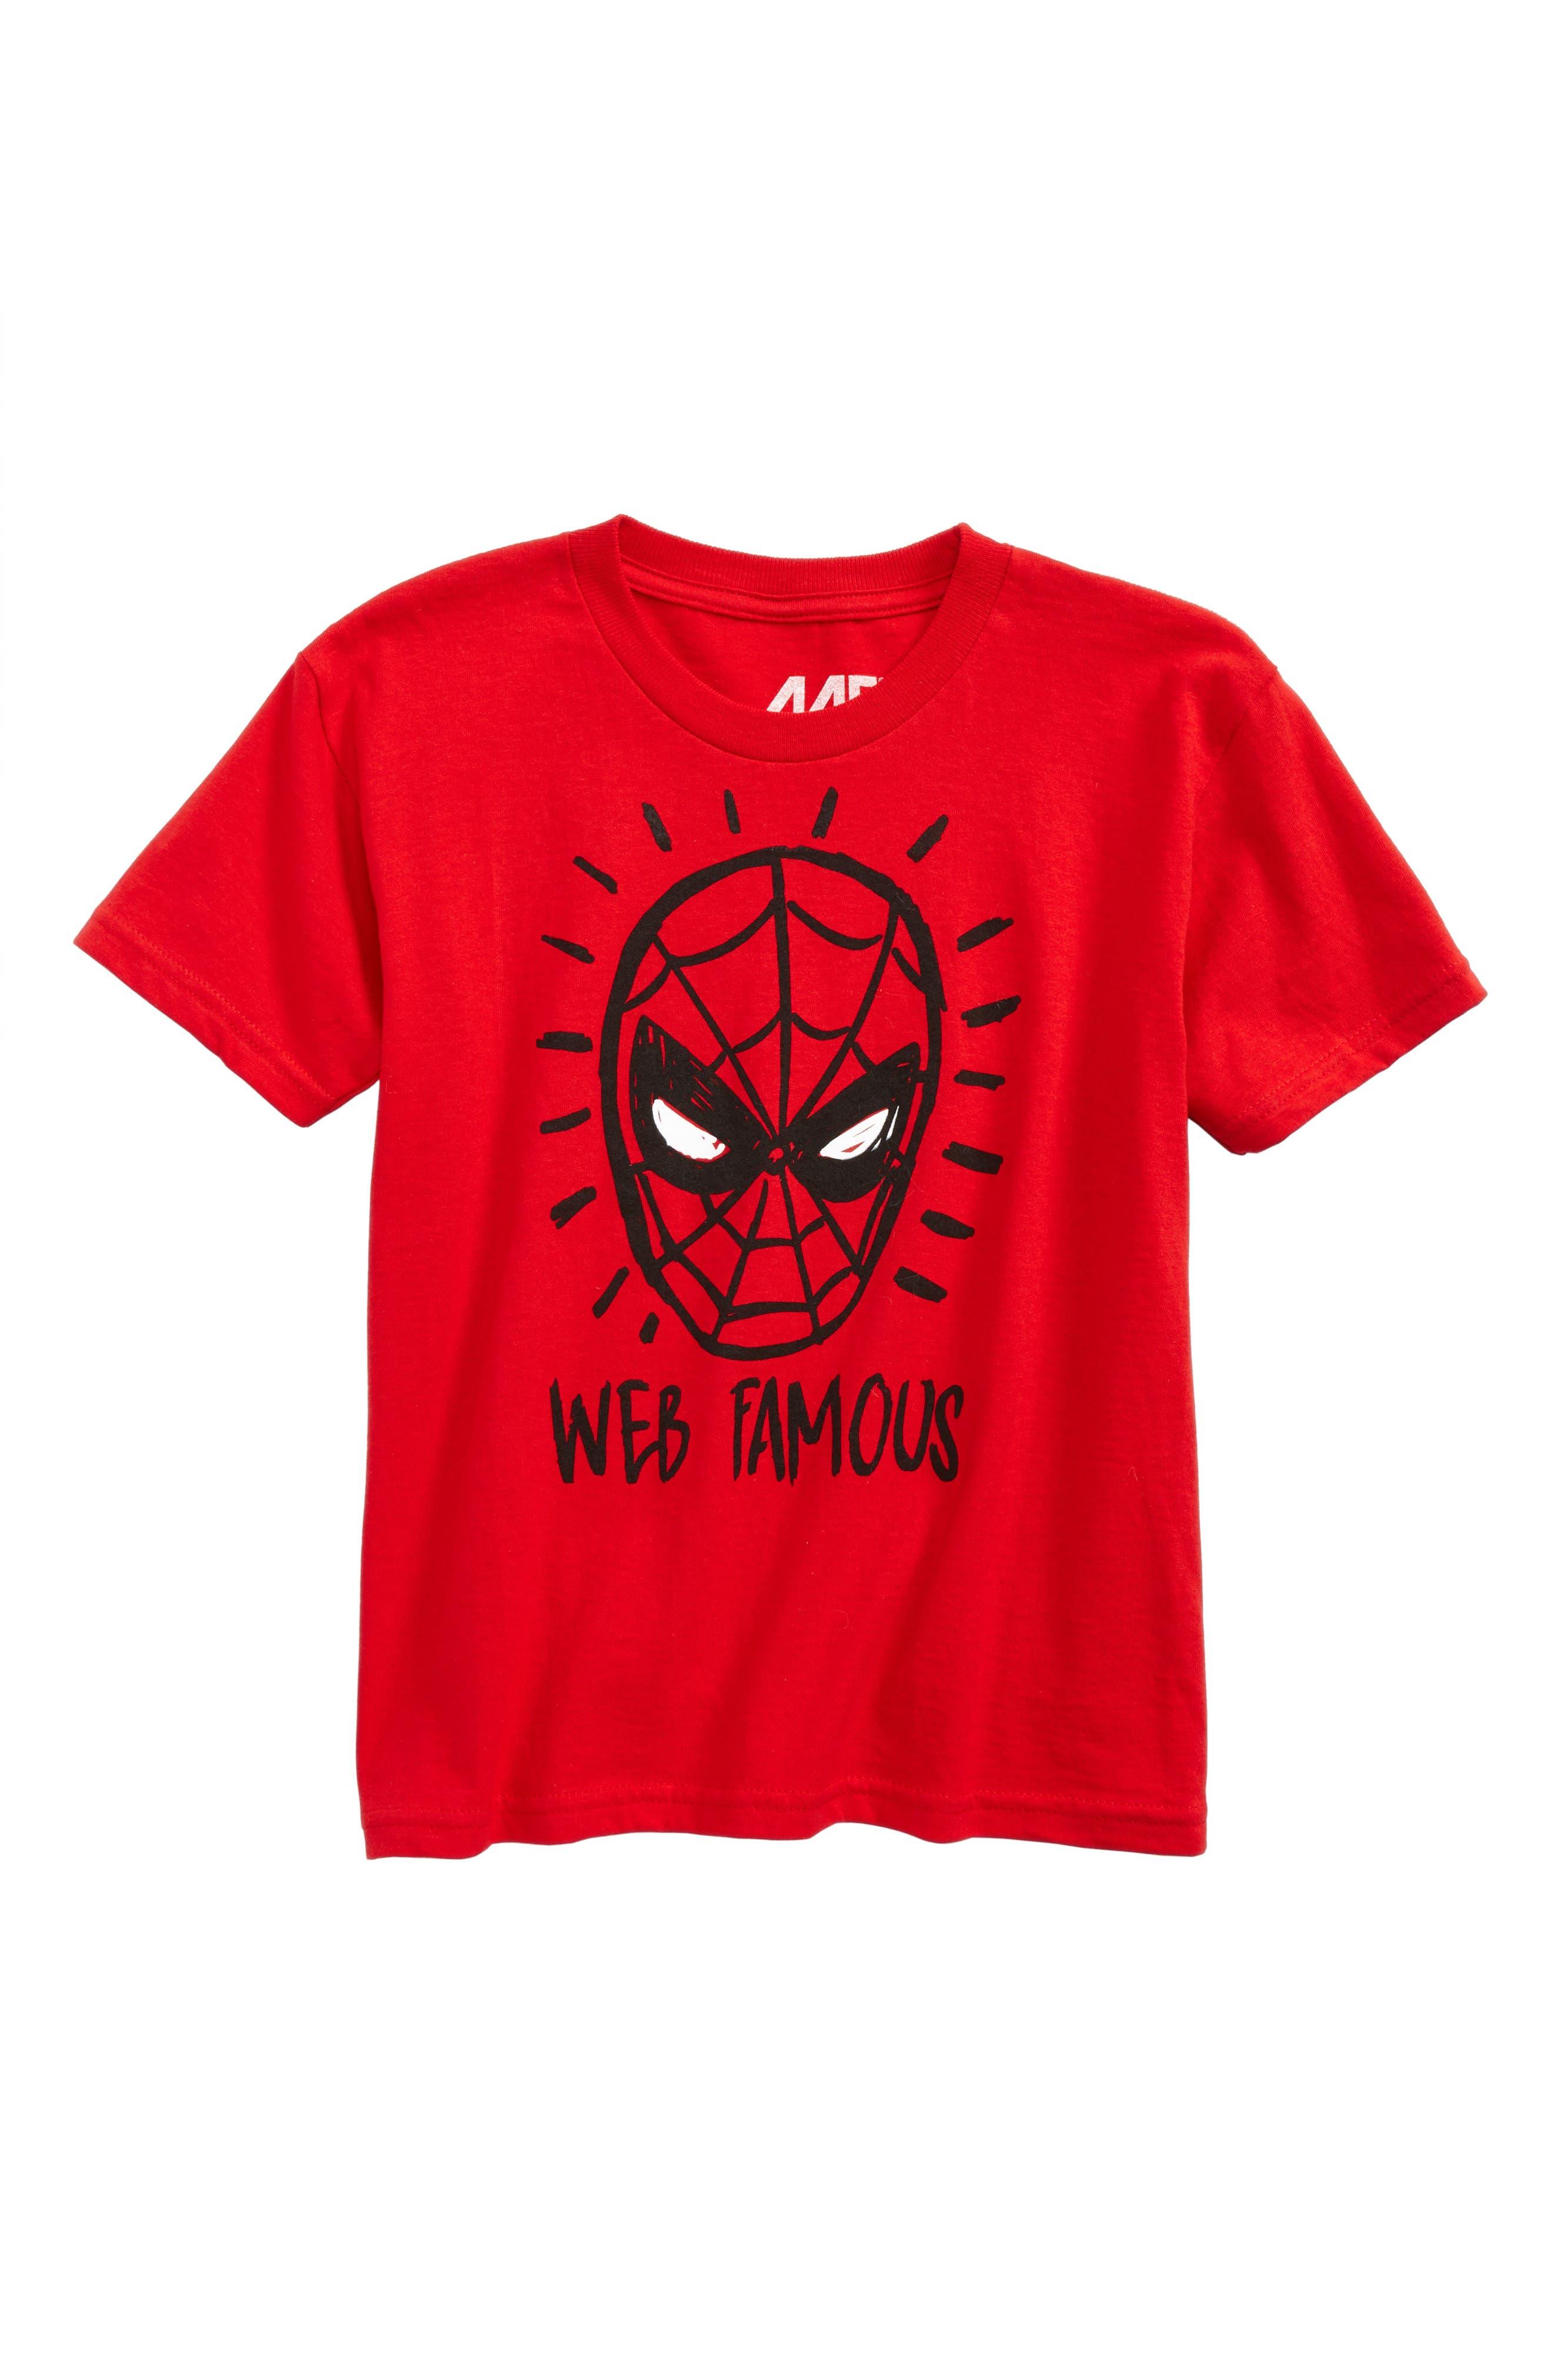 Spider-Man - Web Famous T-Shirt,                             Main thumbnail 1, color,                             615